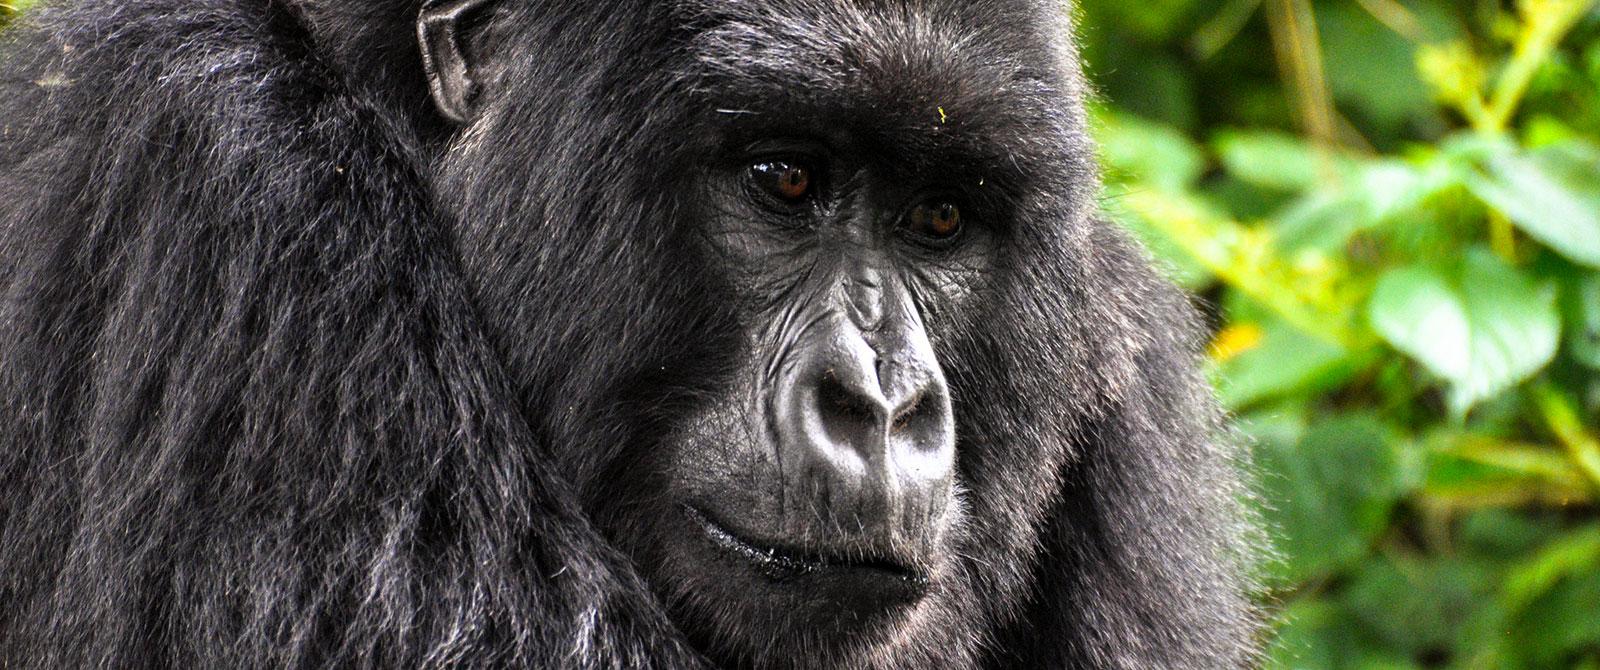 Gorilla Trekking, Wild Gorilla Safaris